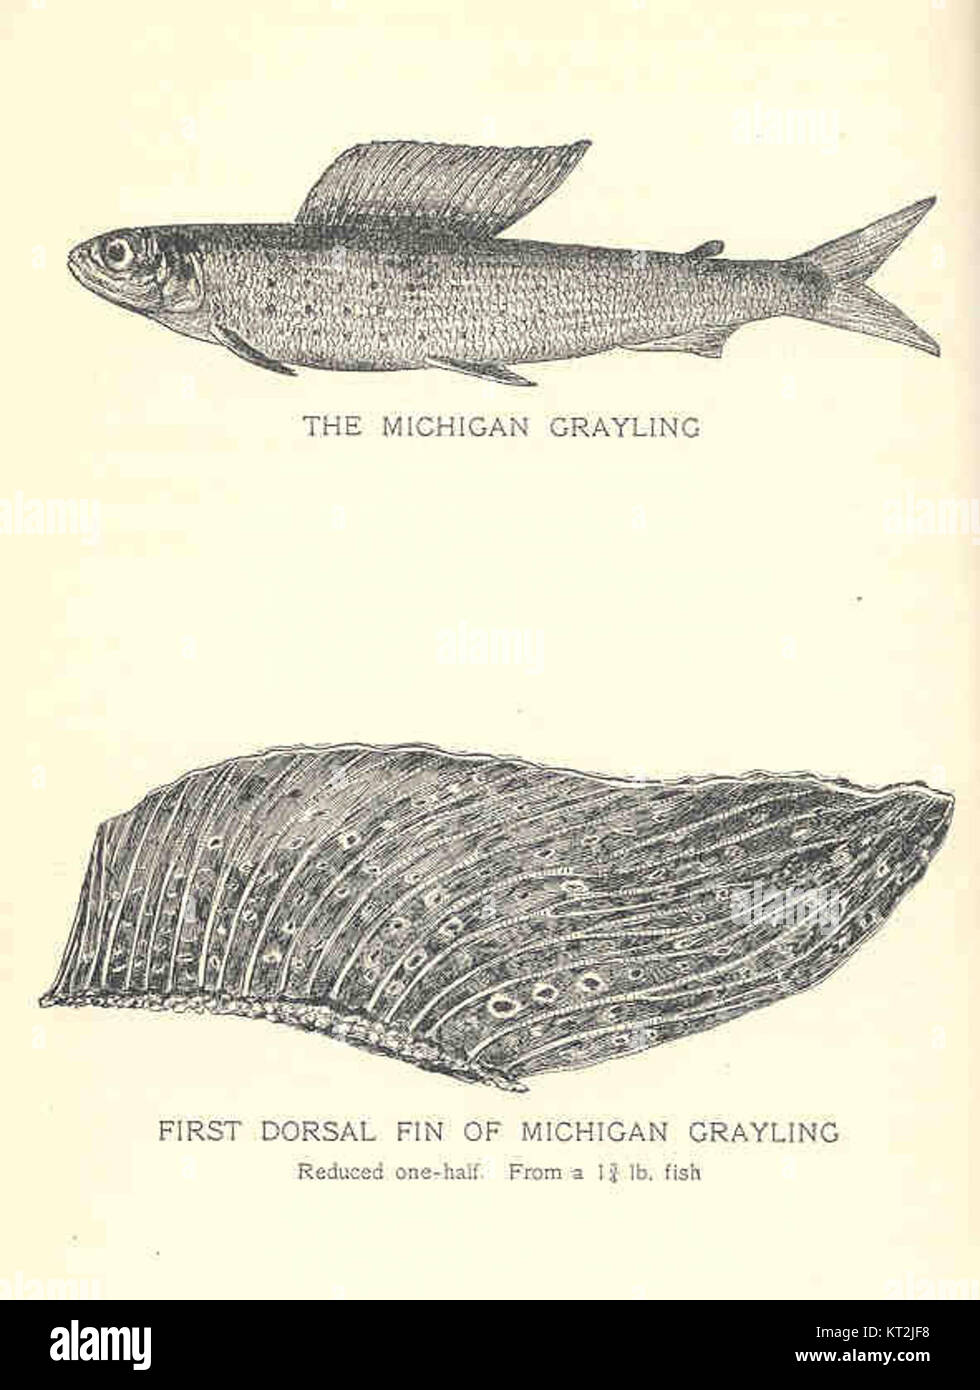 Grayling Fish Michigan   35745 Michigan Grayling First Dorsal Fin Of Michigan Grayling